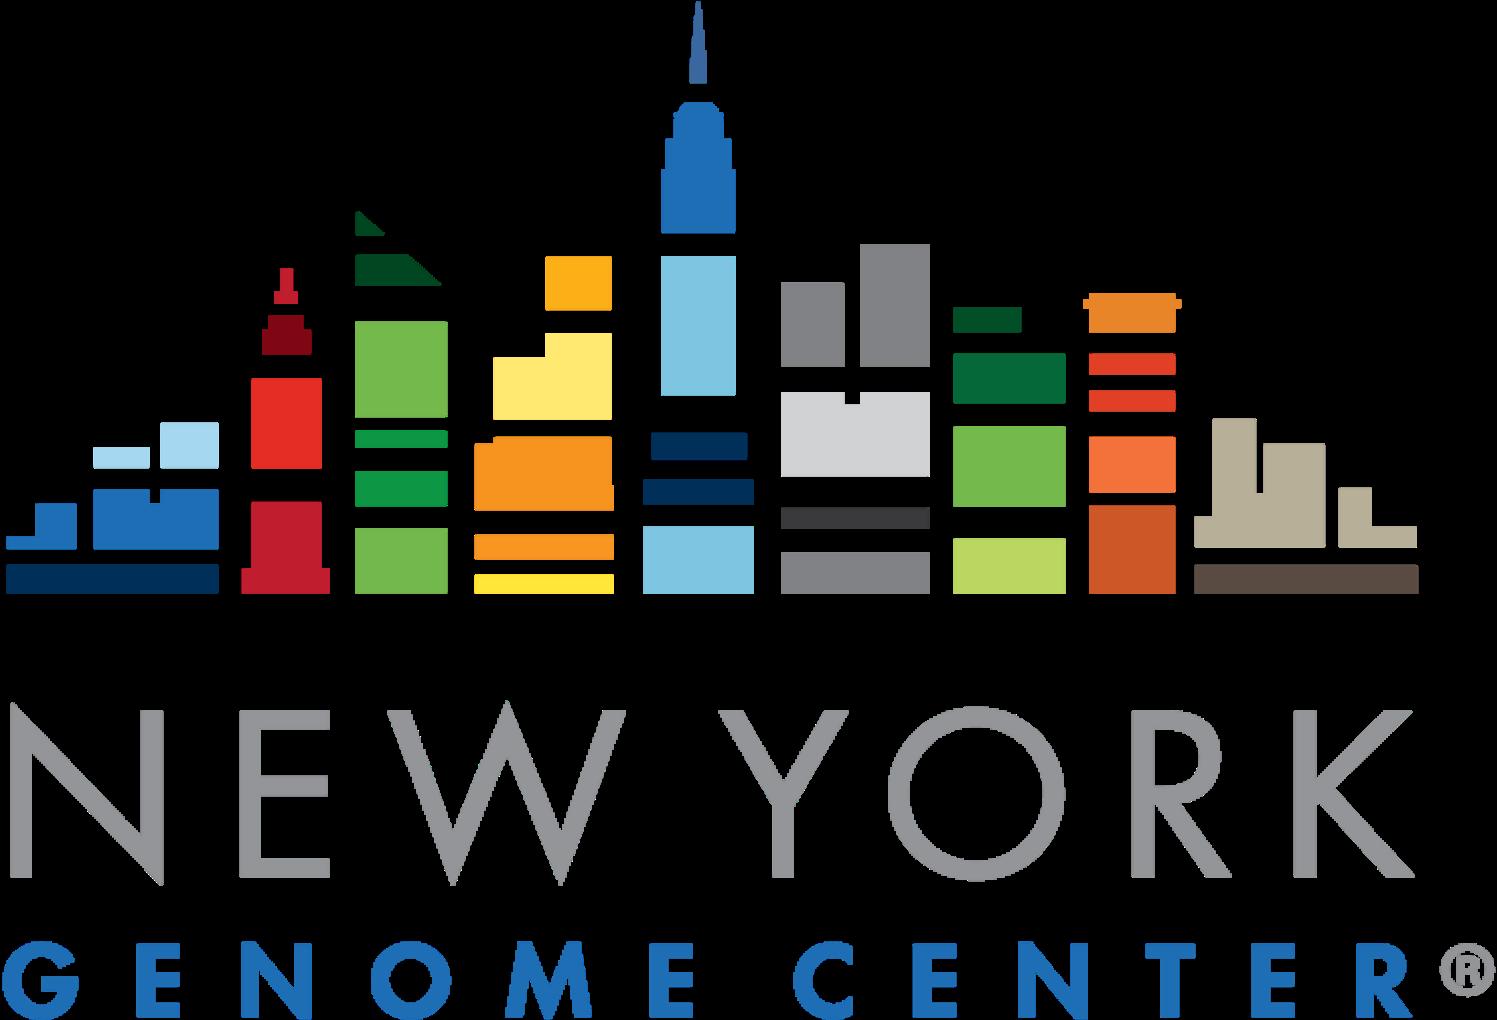 nygc_logo6.png